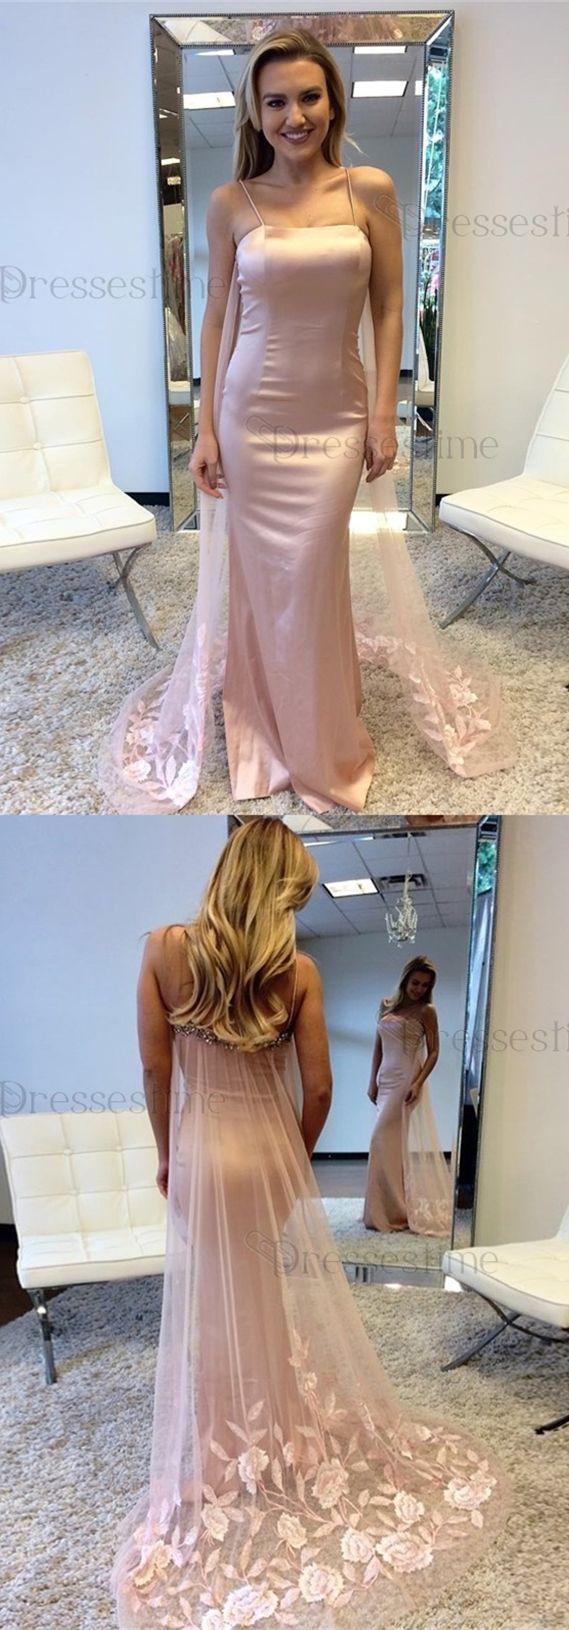 Mermaid spaghetti straps watteau train pearl pink prom dress with